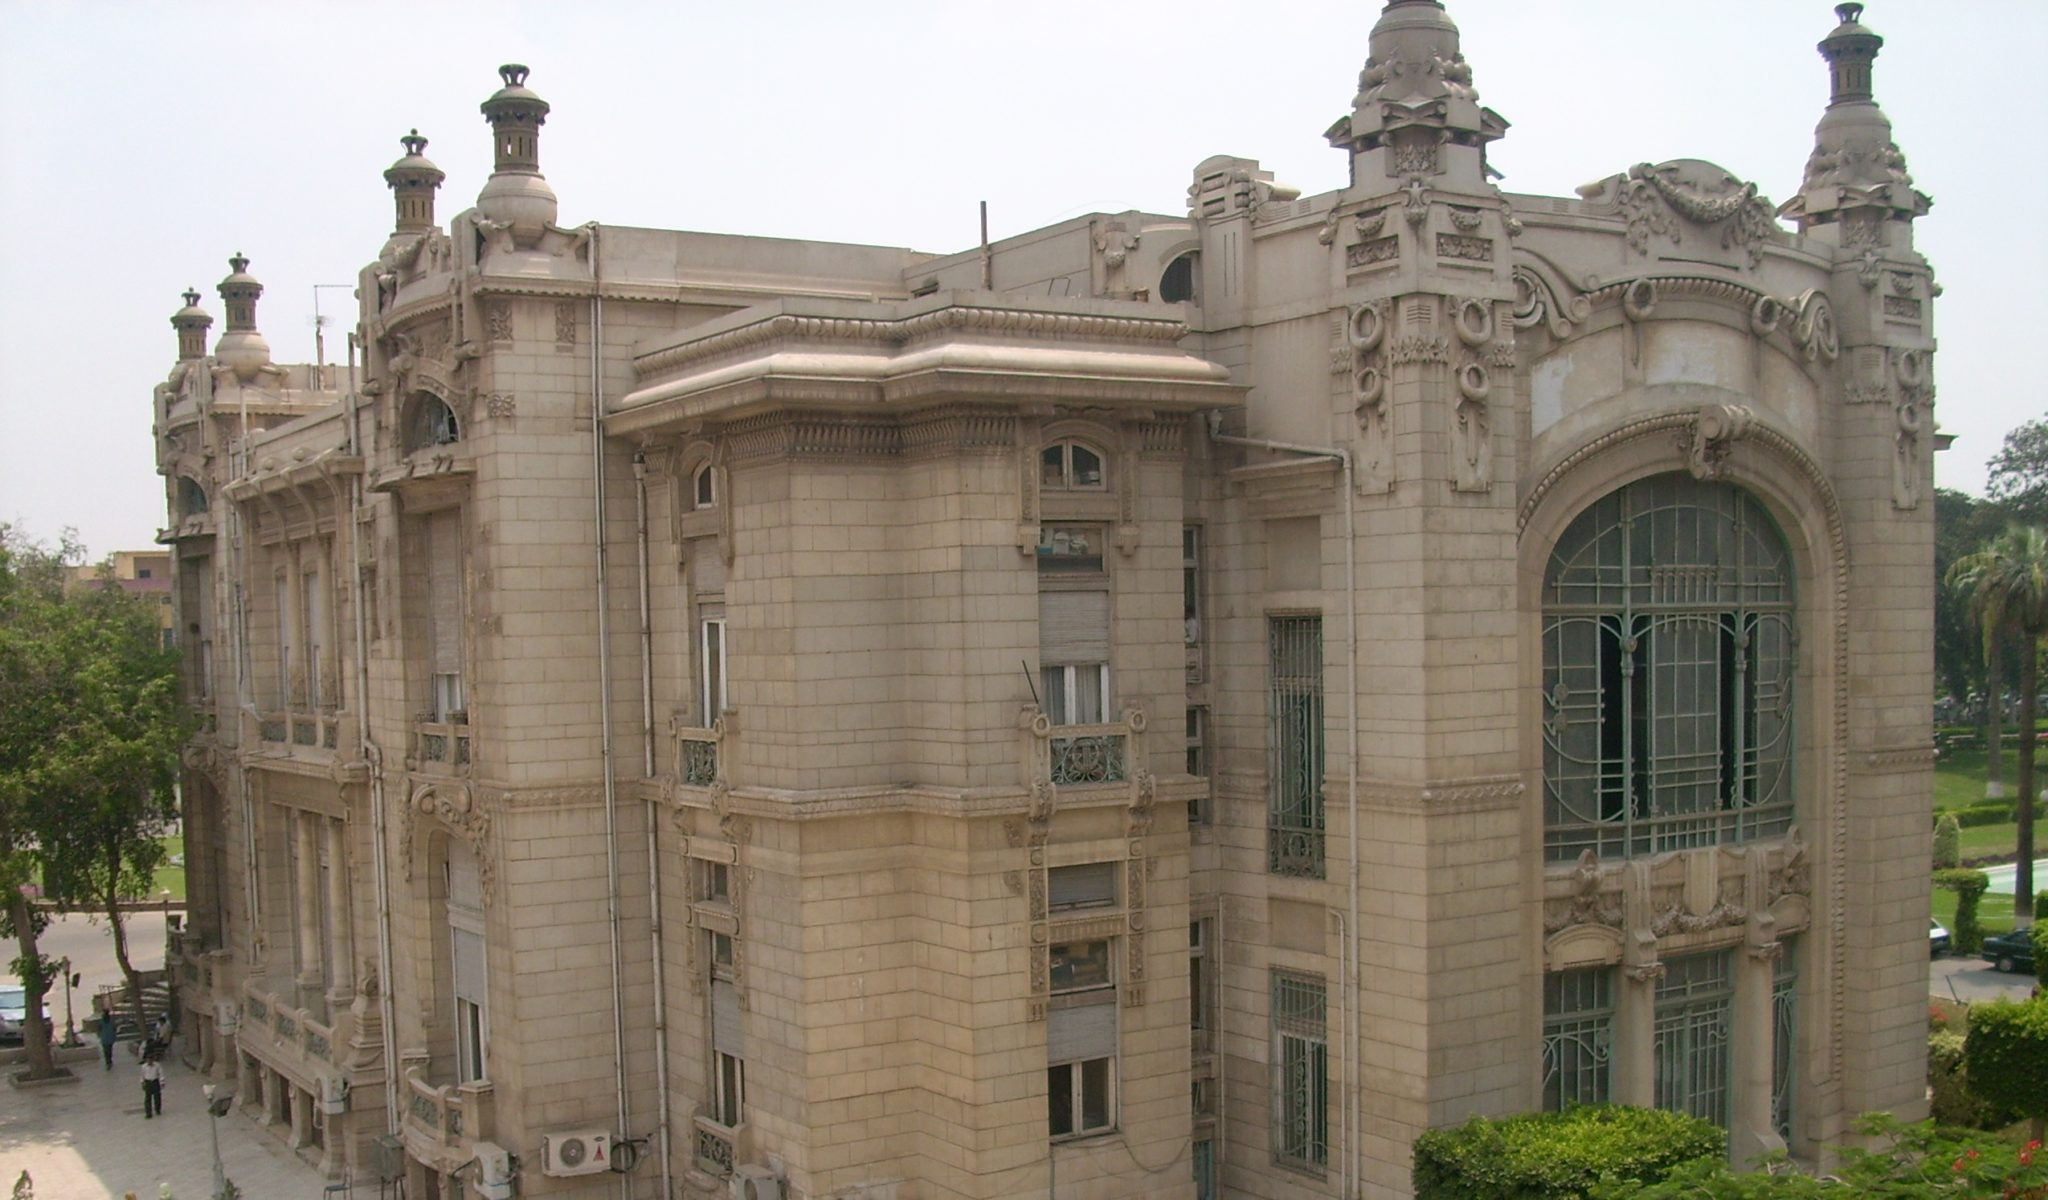 Ain Shams University Campus